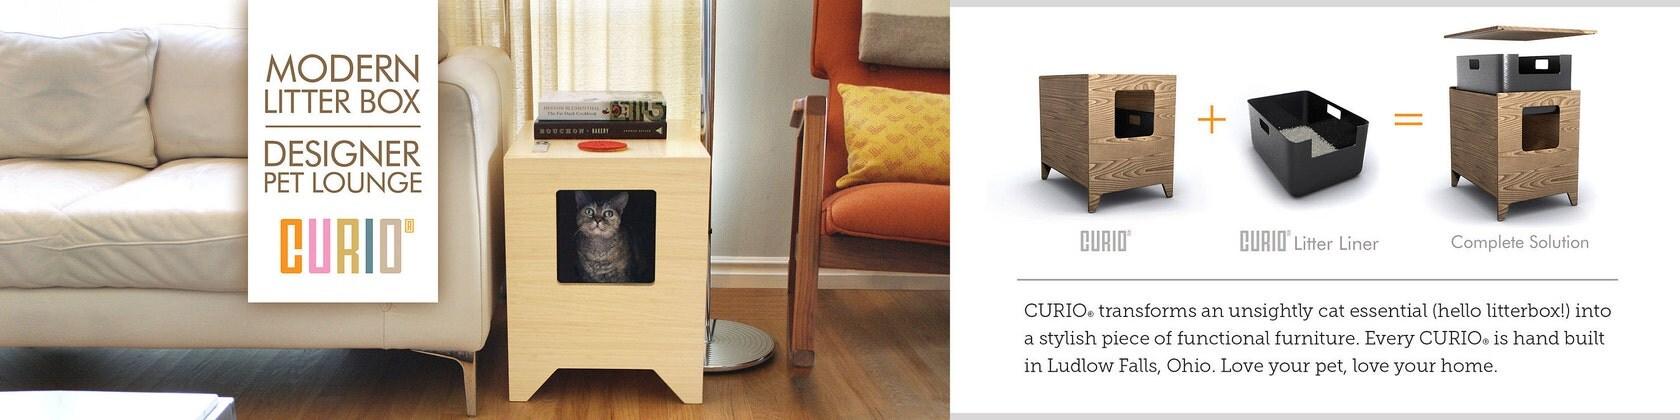 Modern Litter Box Cat Furniture Pet House By CURIOSF